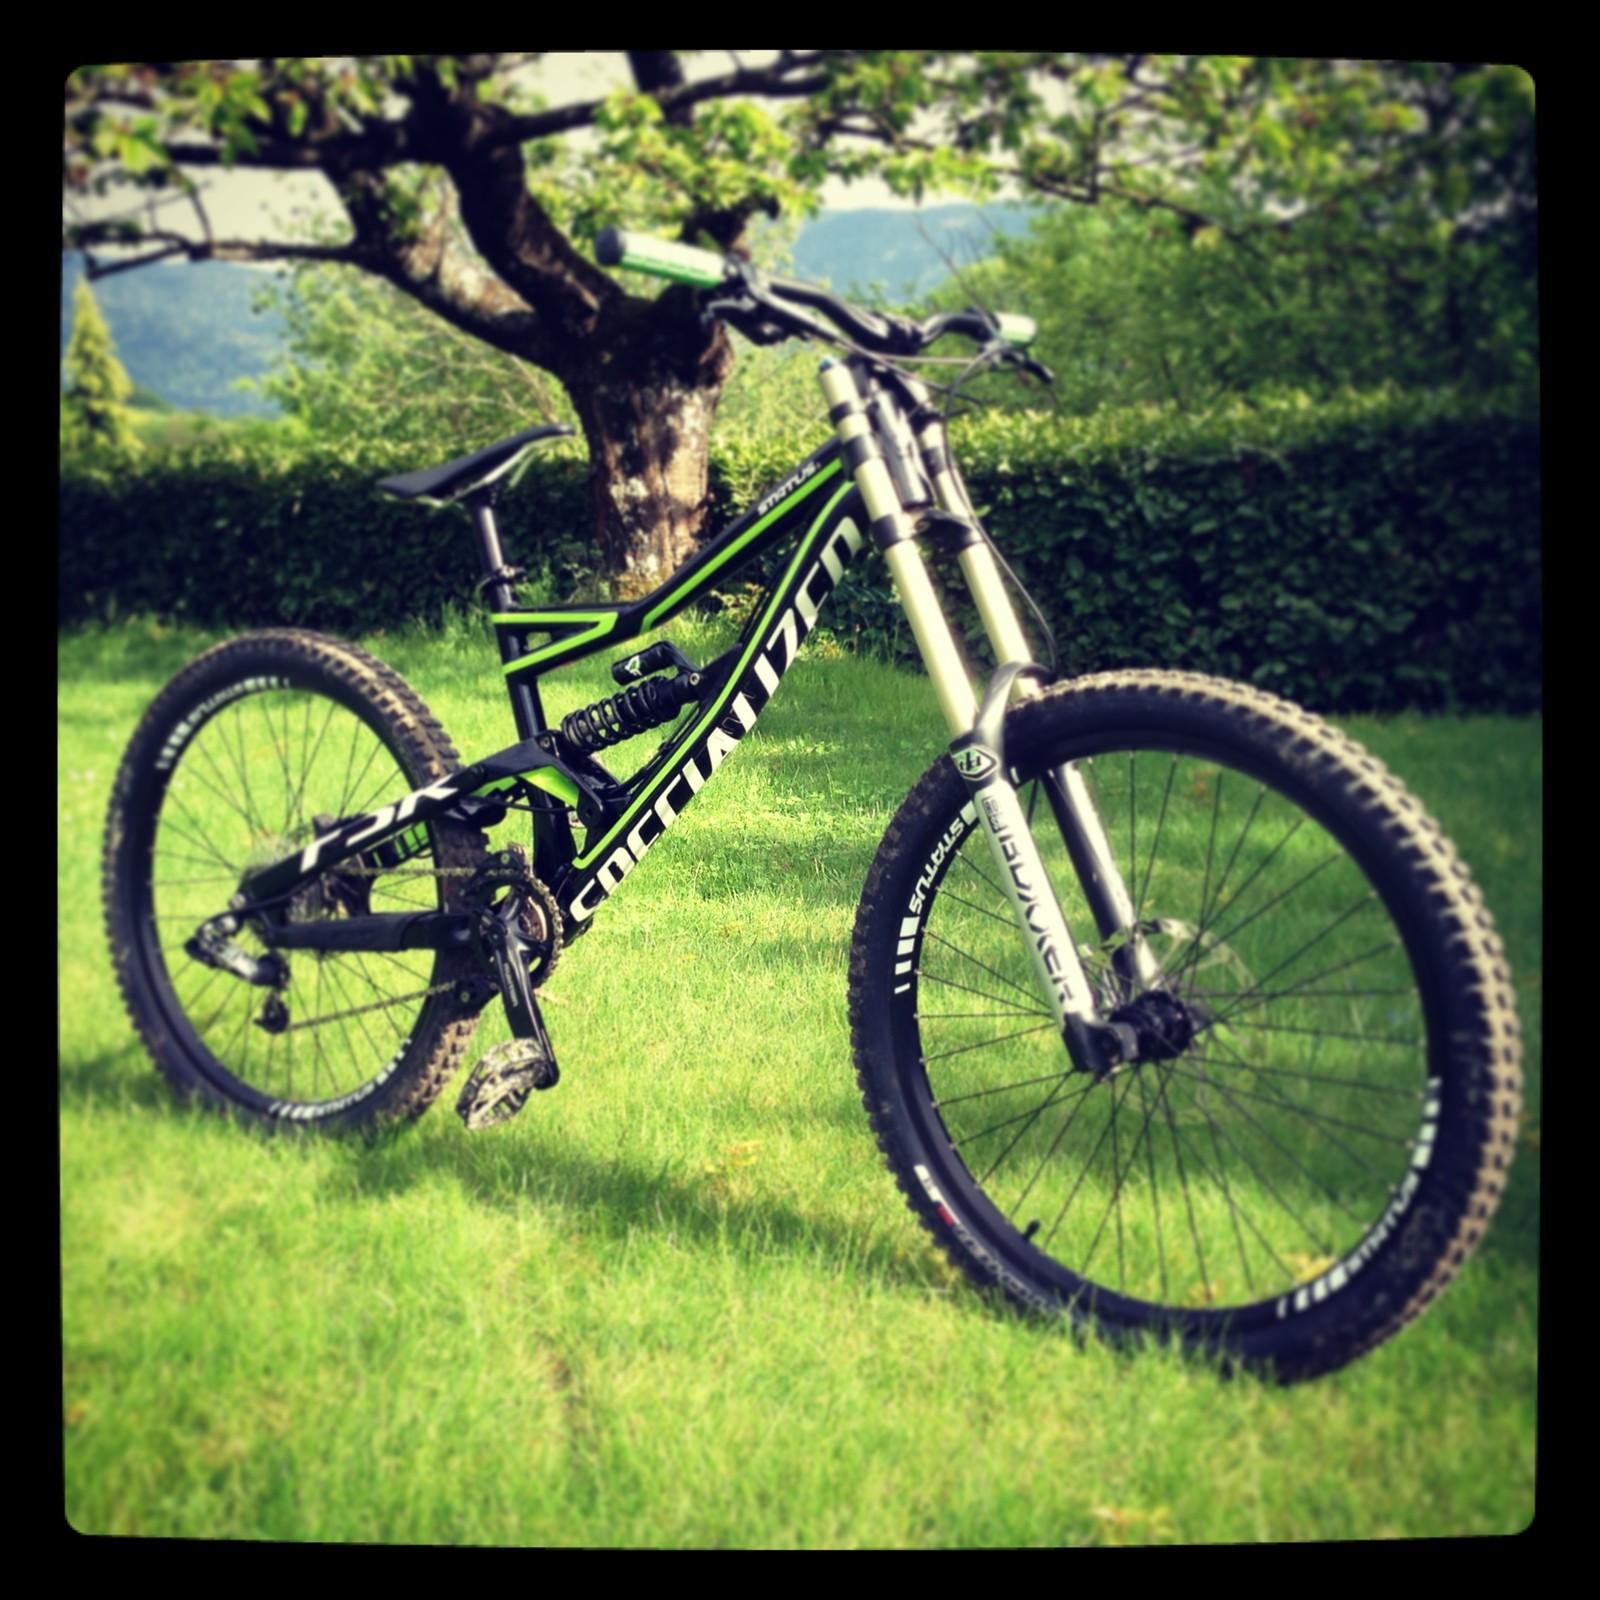 My Bike 2 - gilles.pfeiffer - Mountain Biking Pictures - Vital MTB